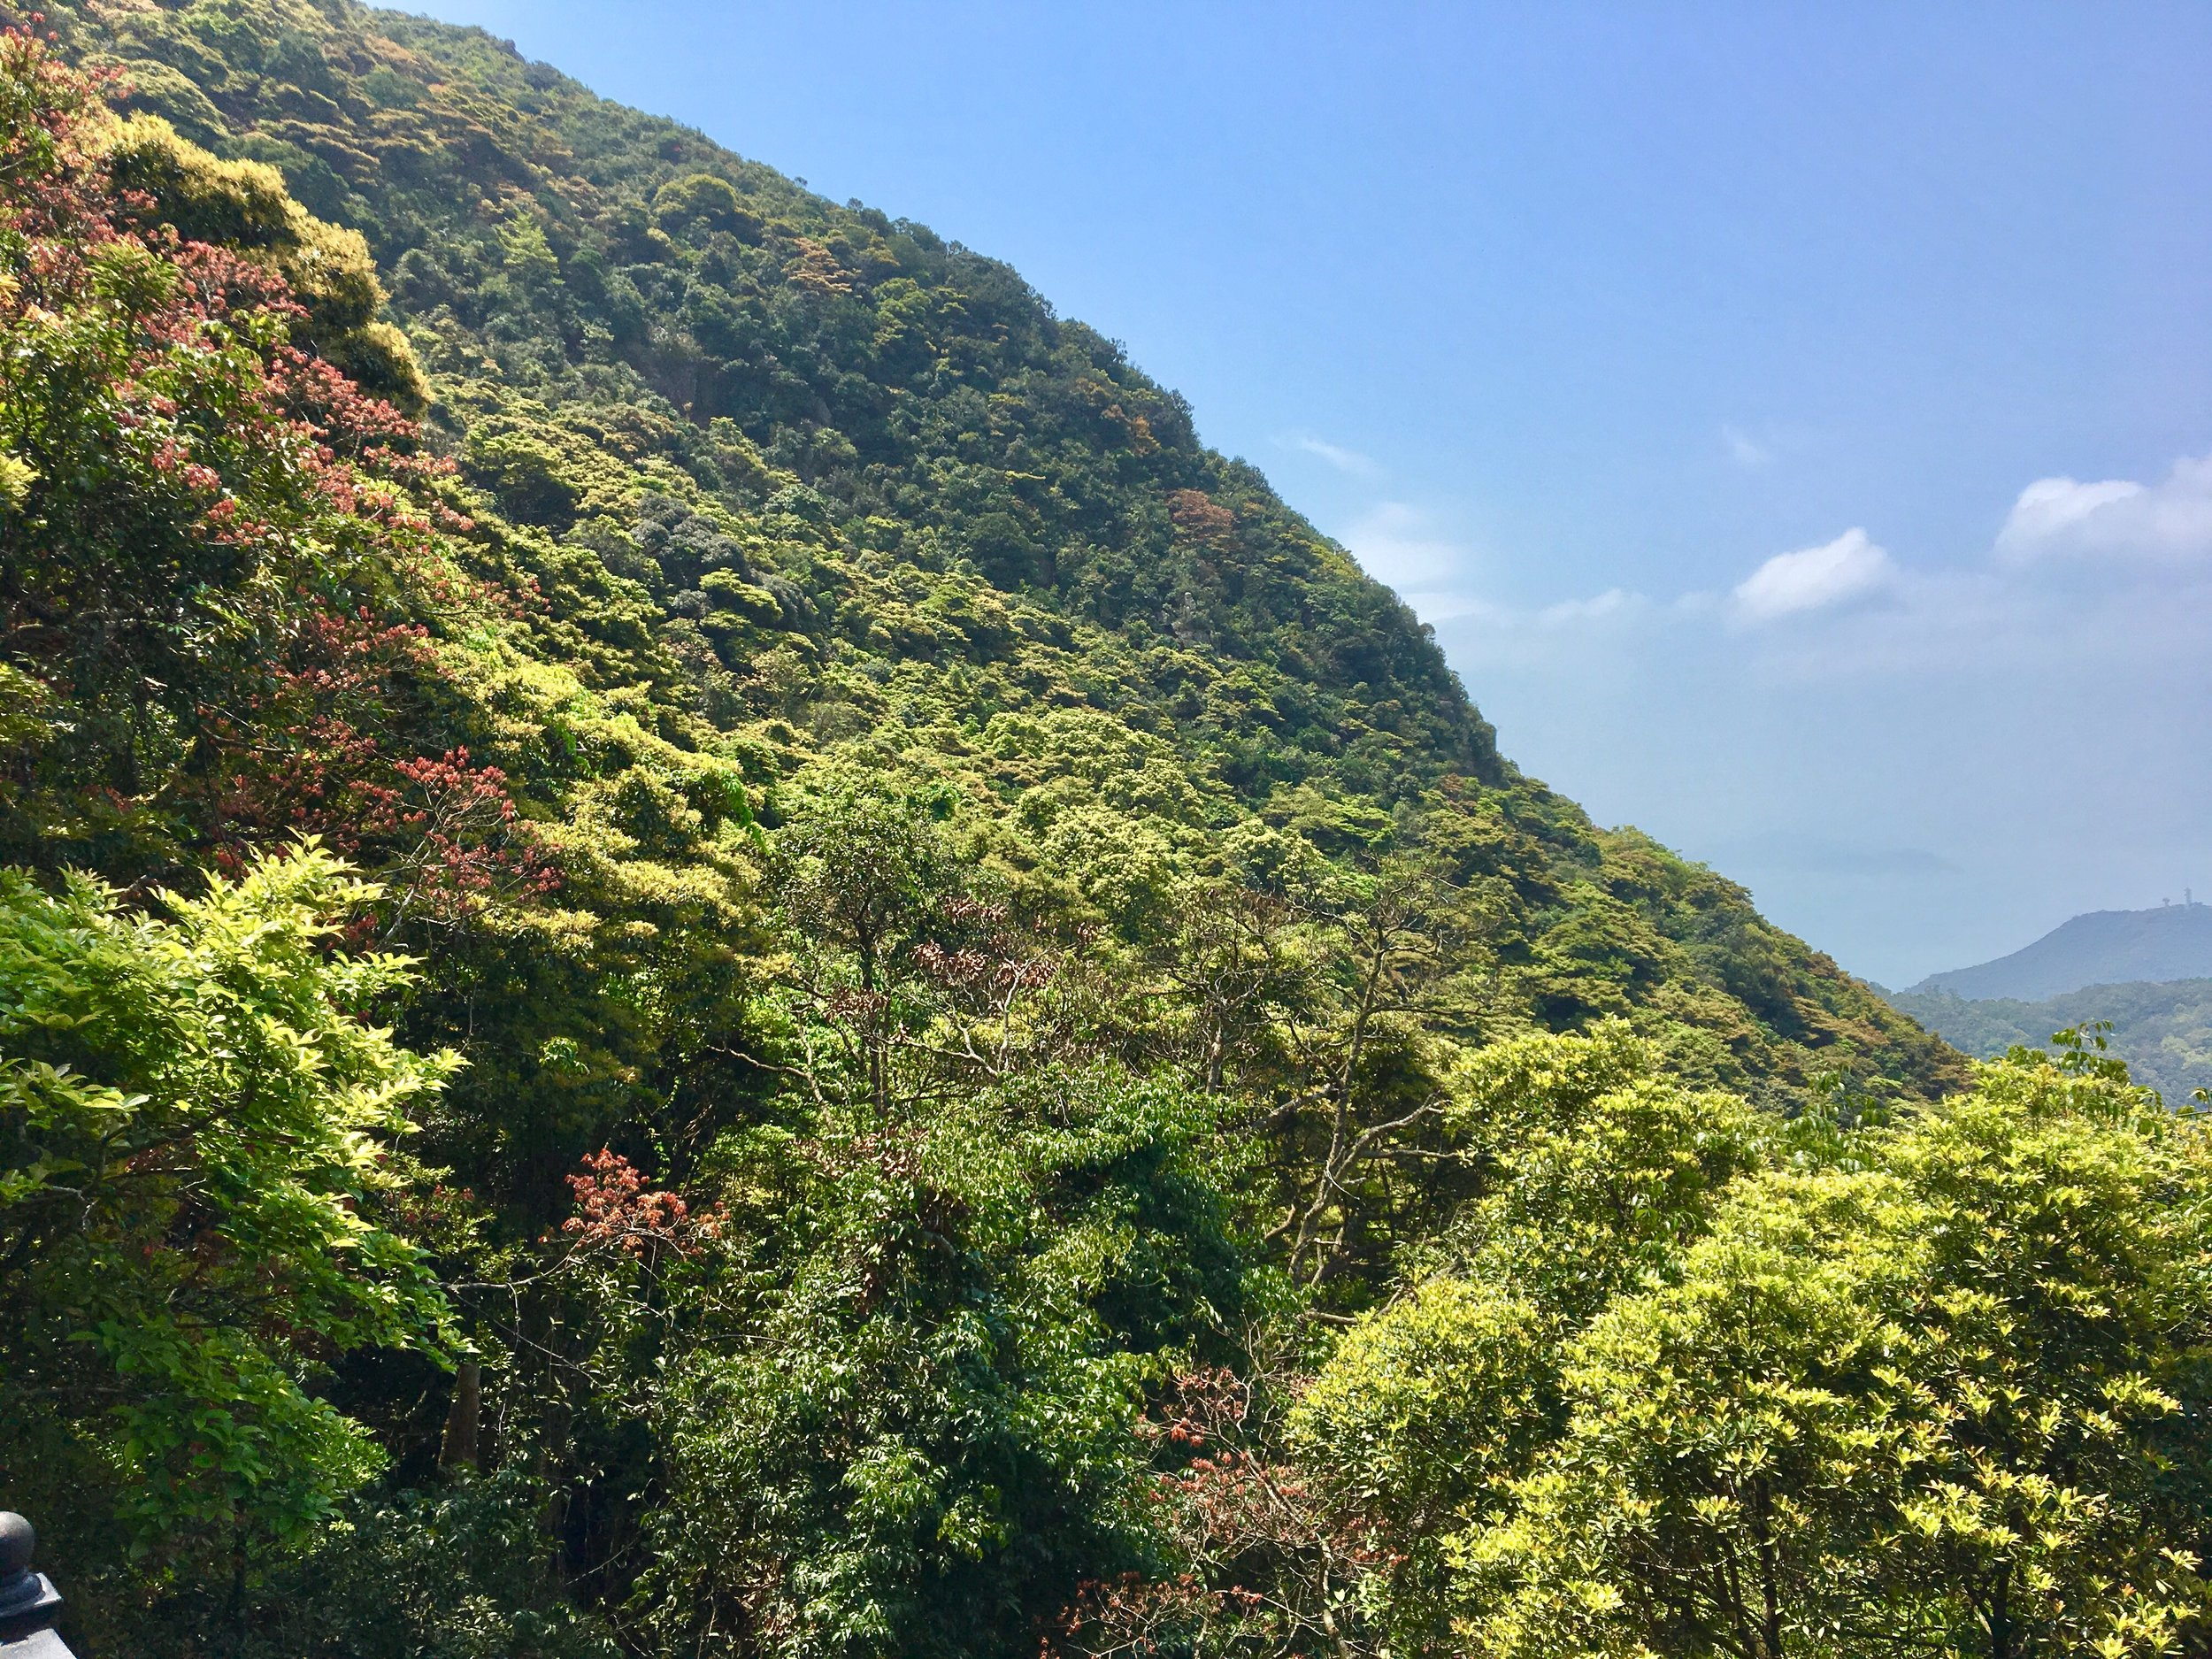 Forest Walk Atop the Peak